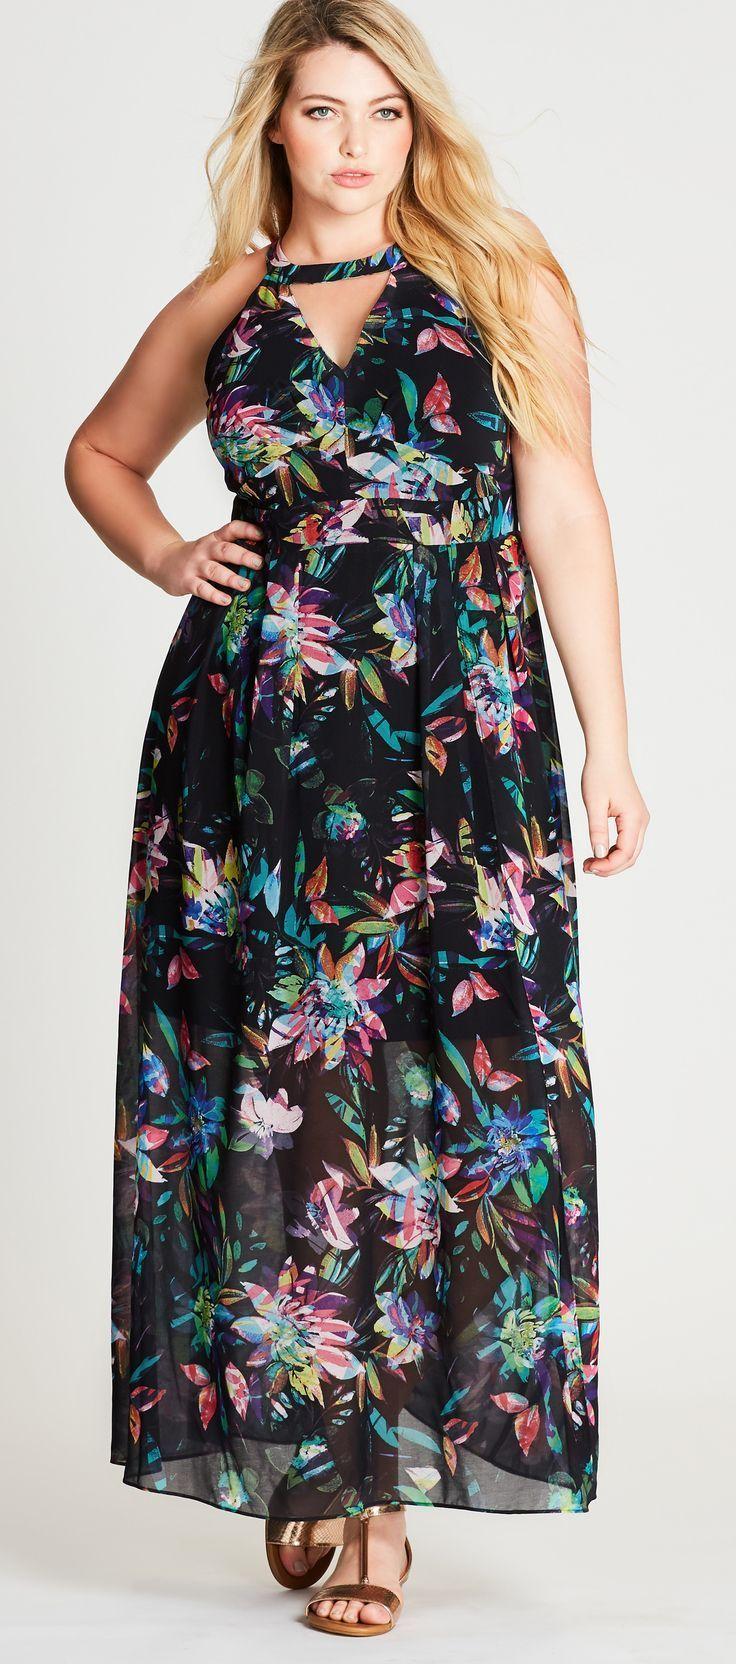 Plus size maxi dress summer plus size fashion favorites